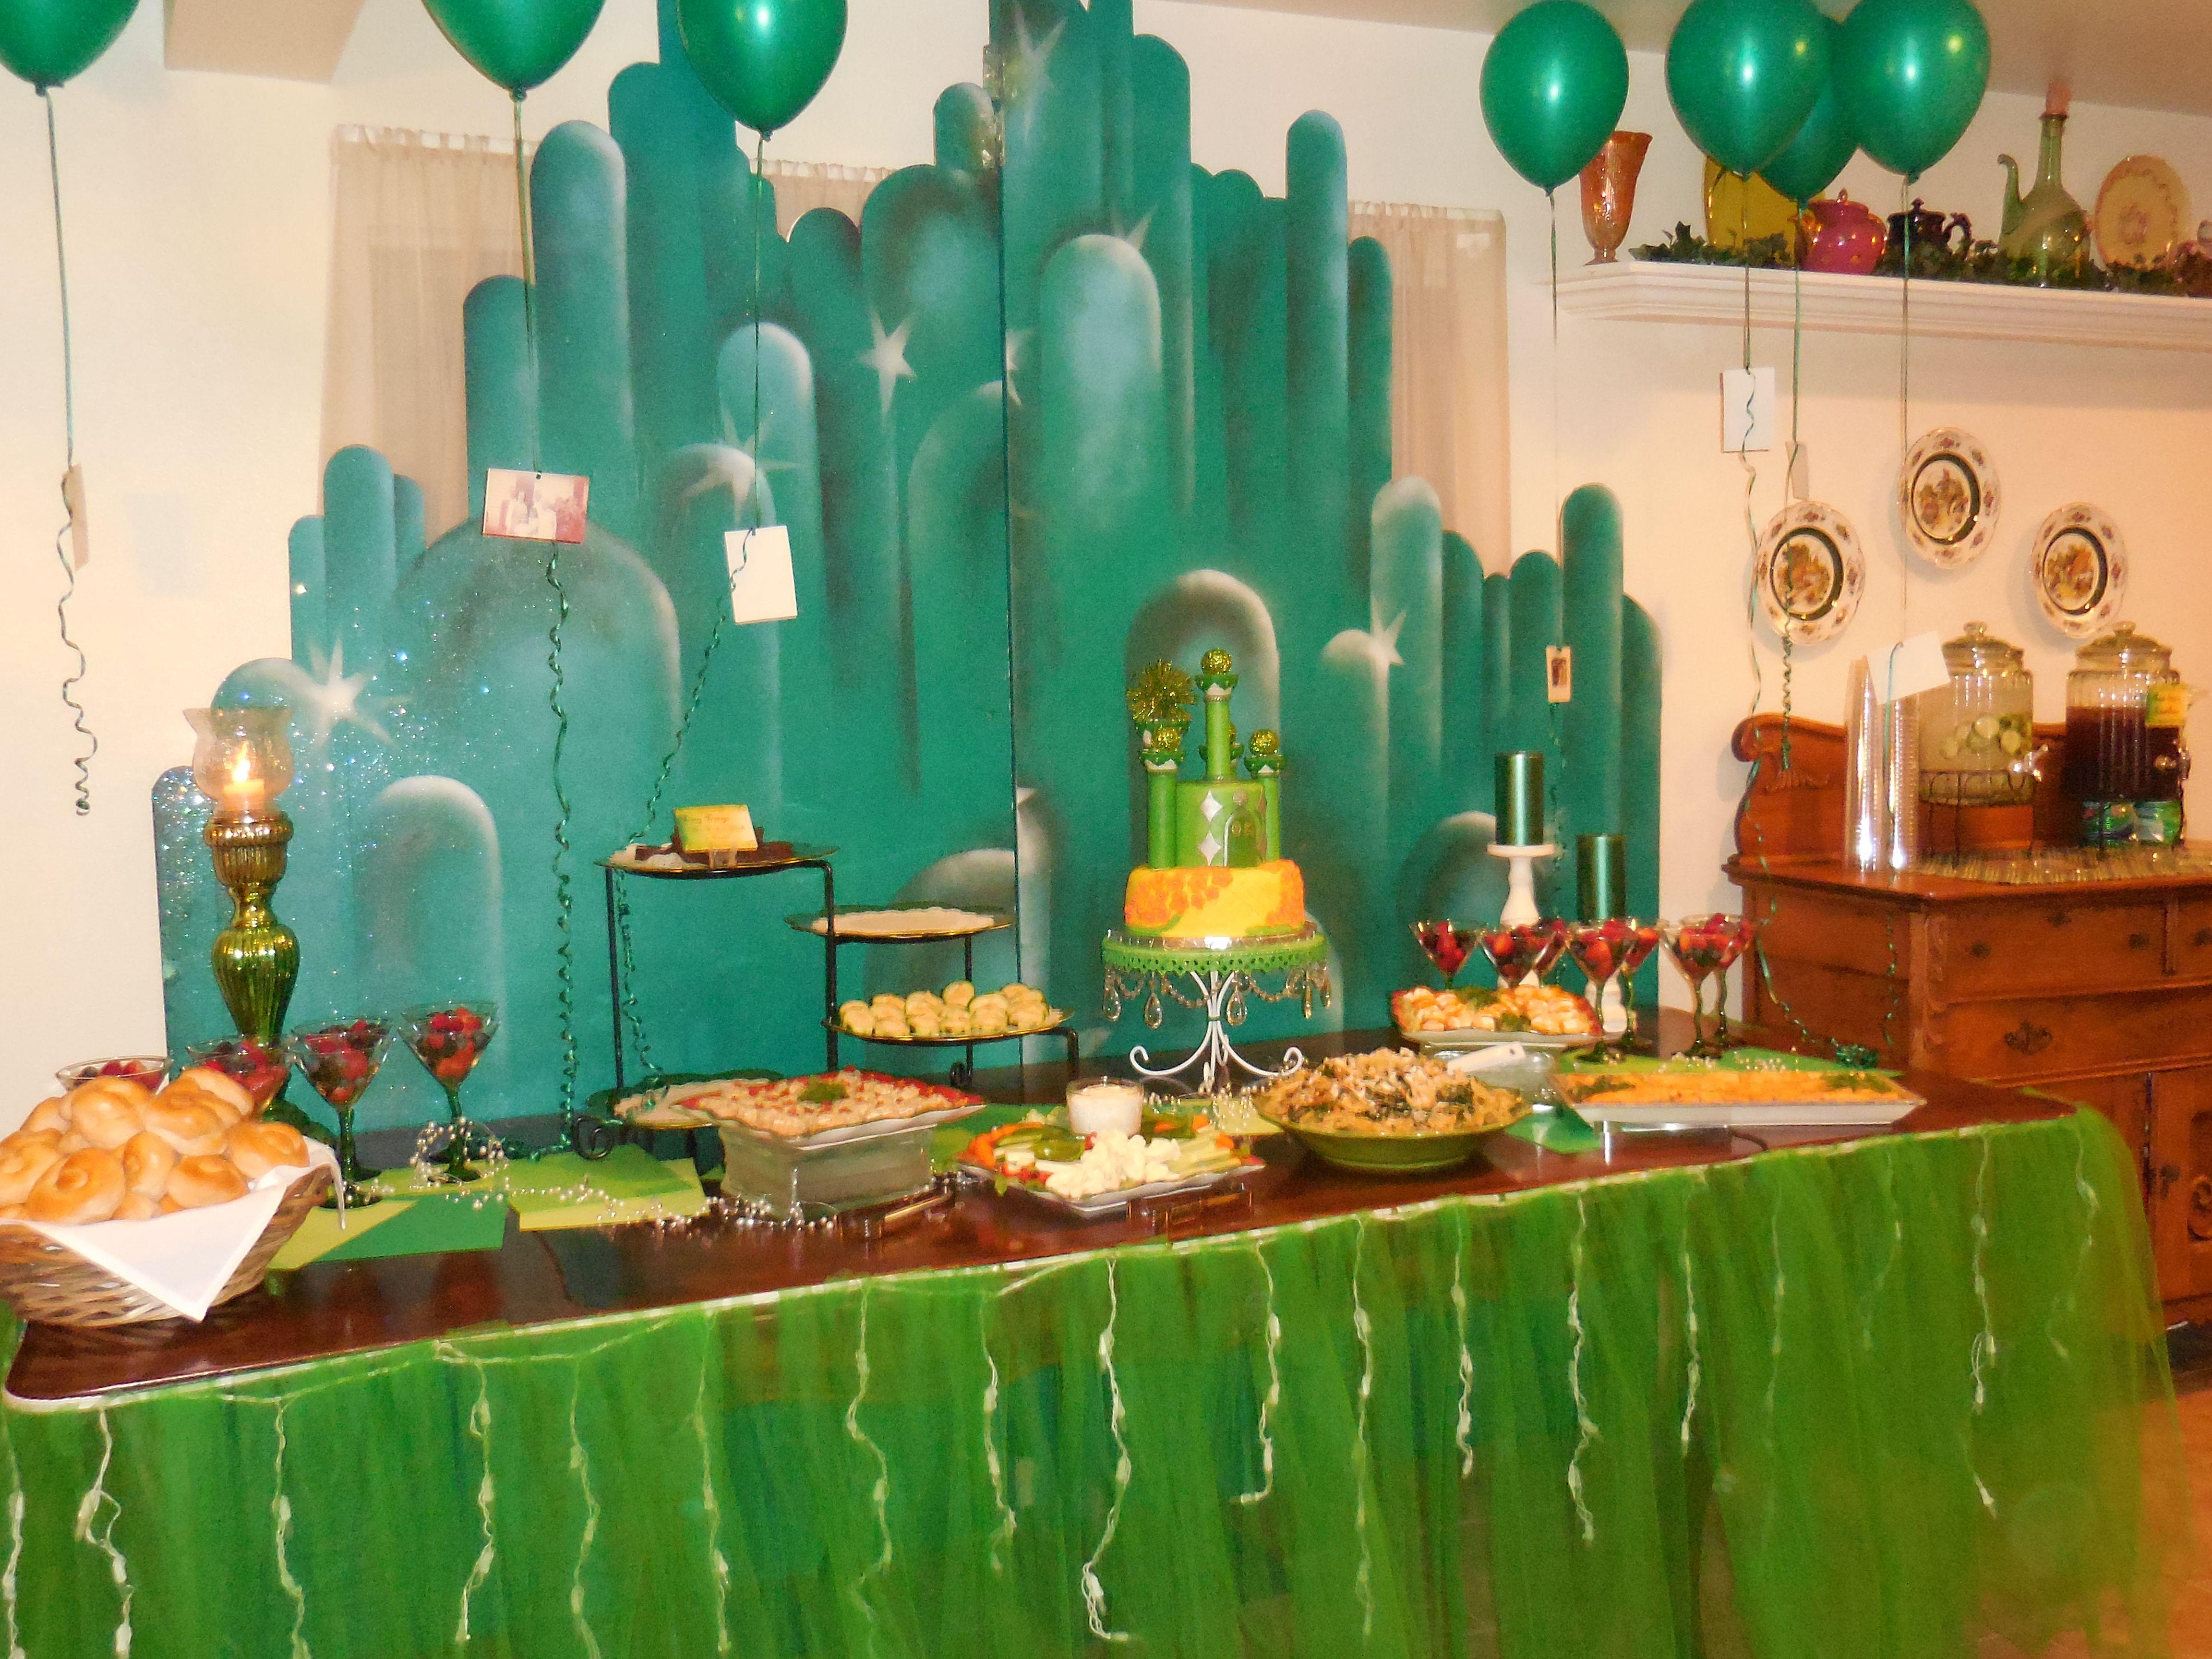 emerald city for pinterest - photo #33